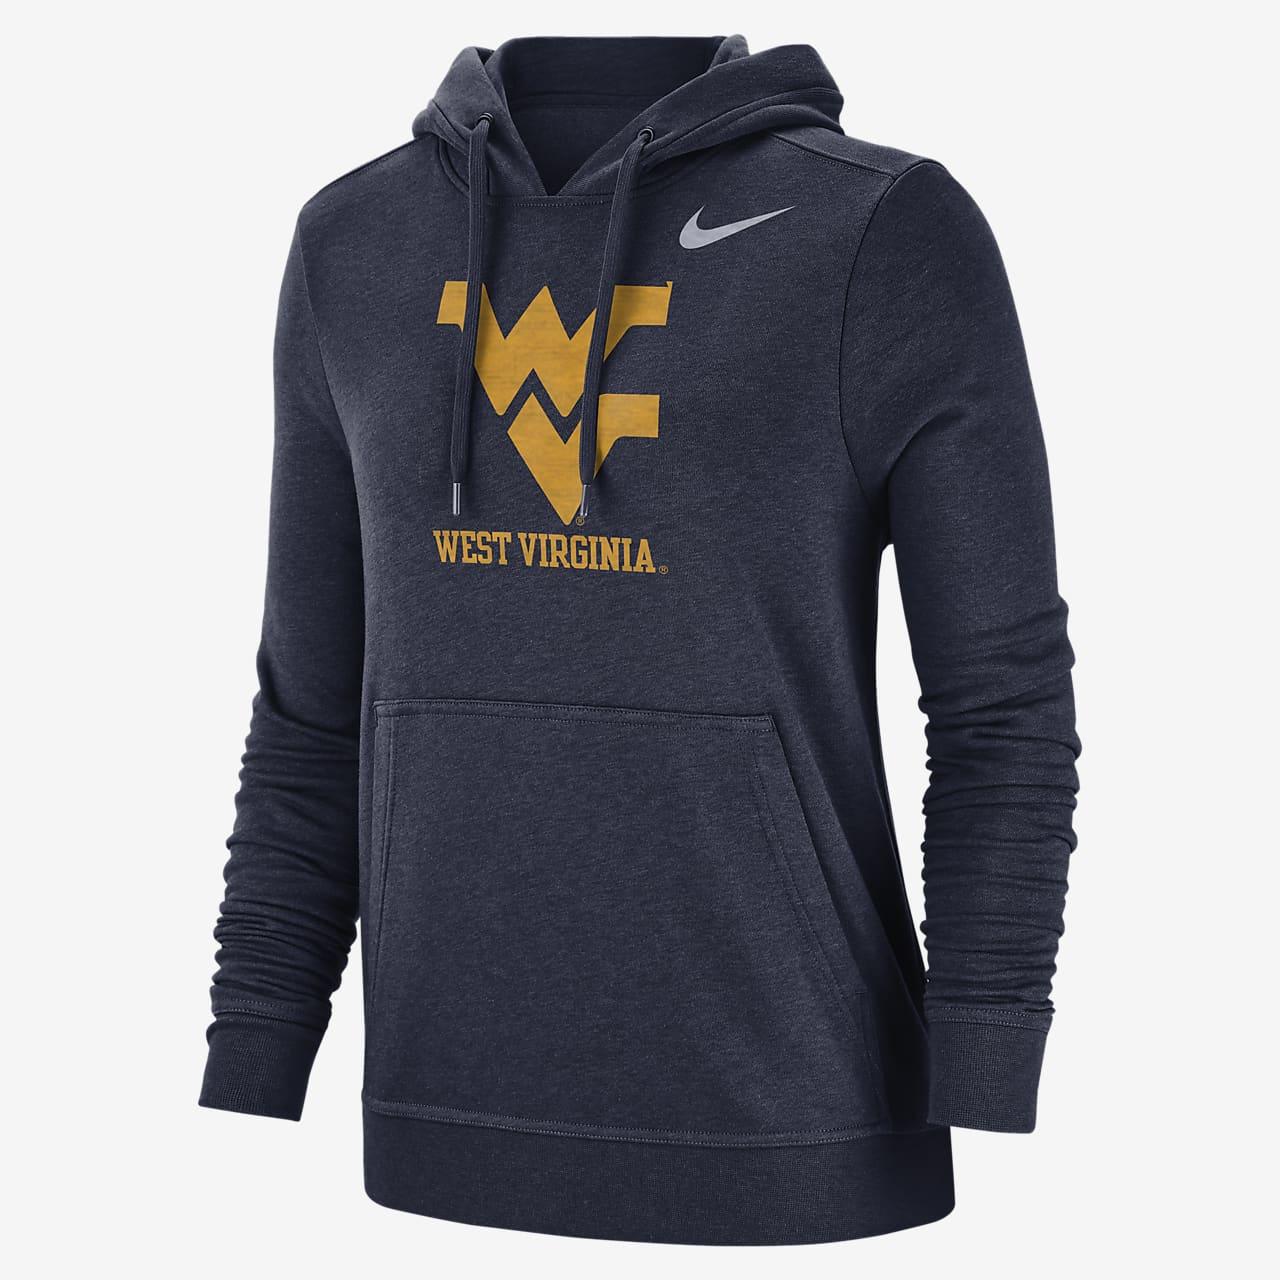 Nike College Club Fleece (West Virginia) Women's Pullover Hoodie